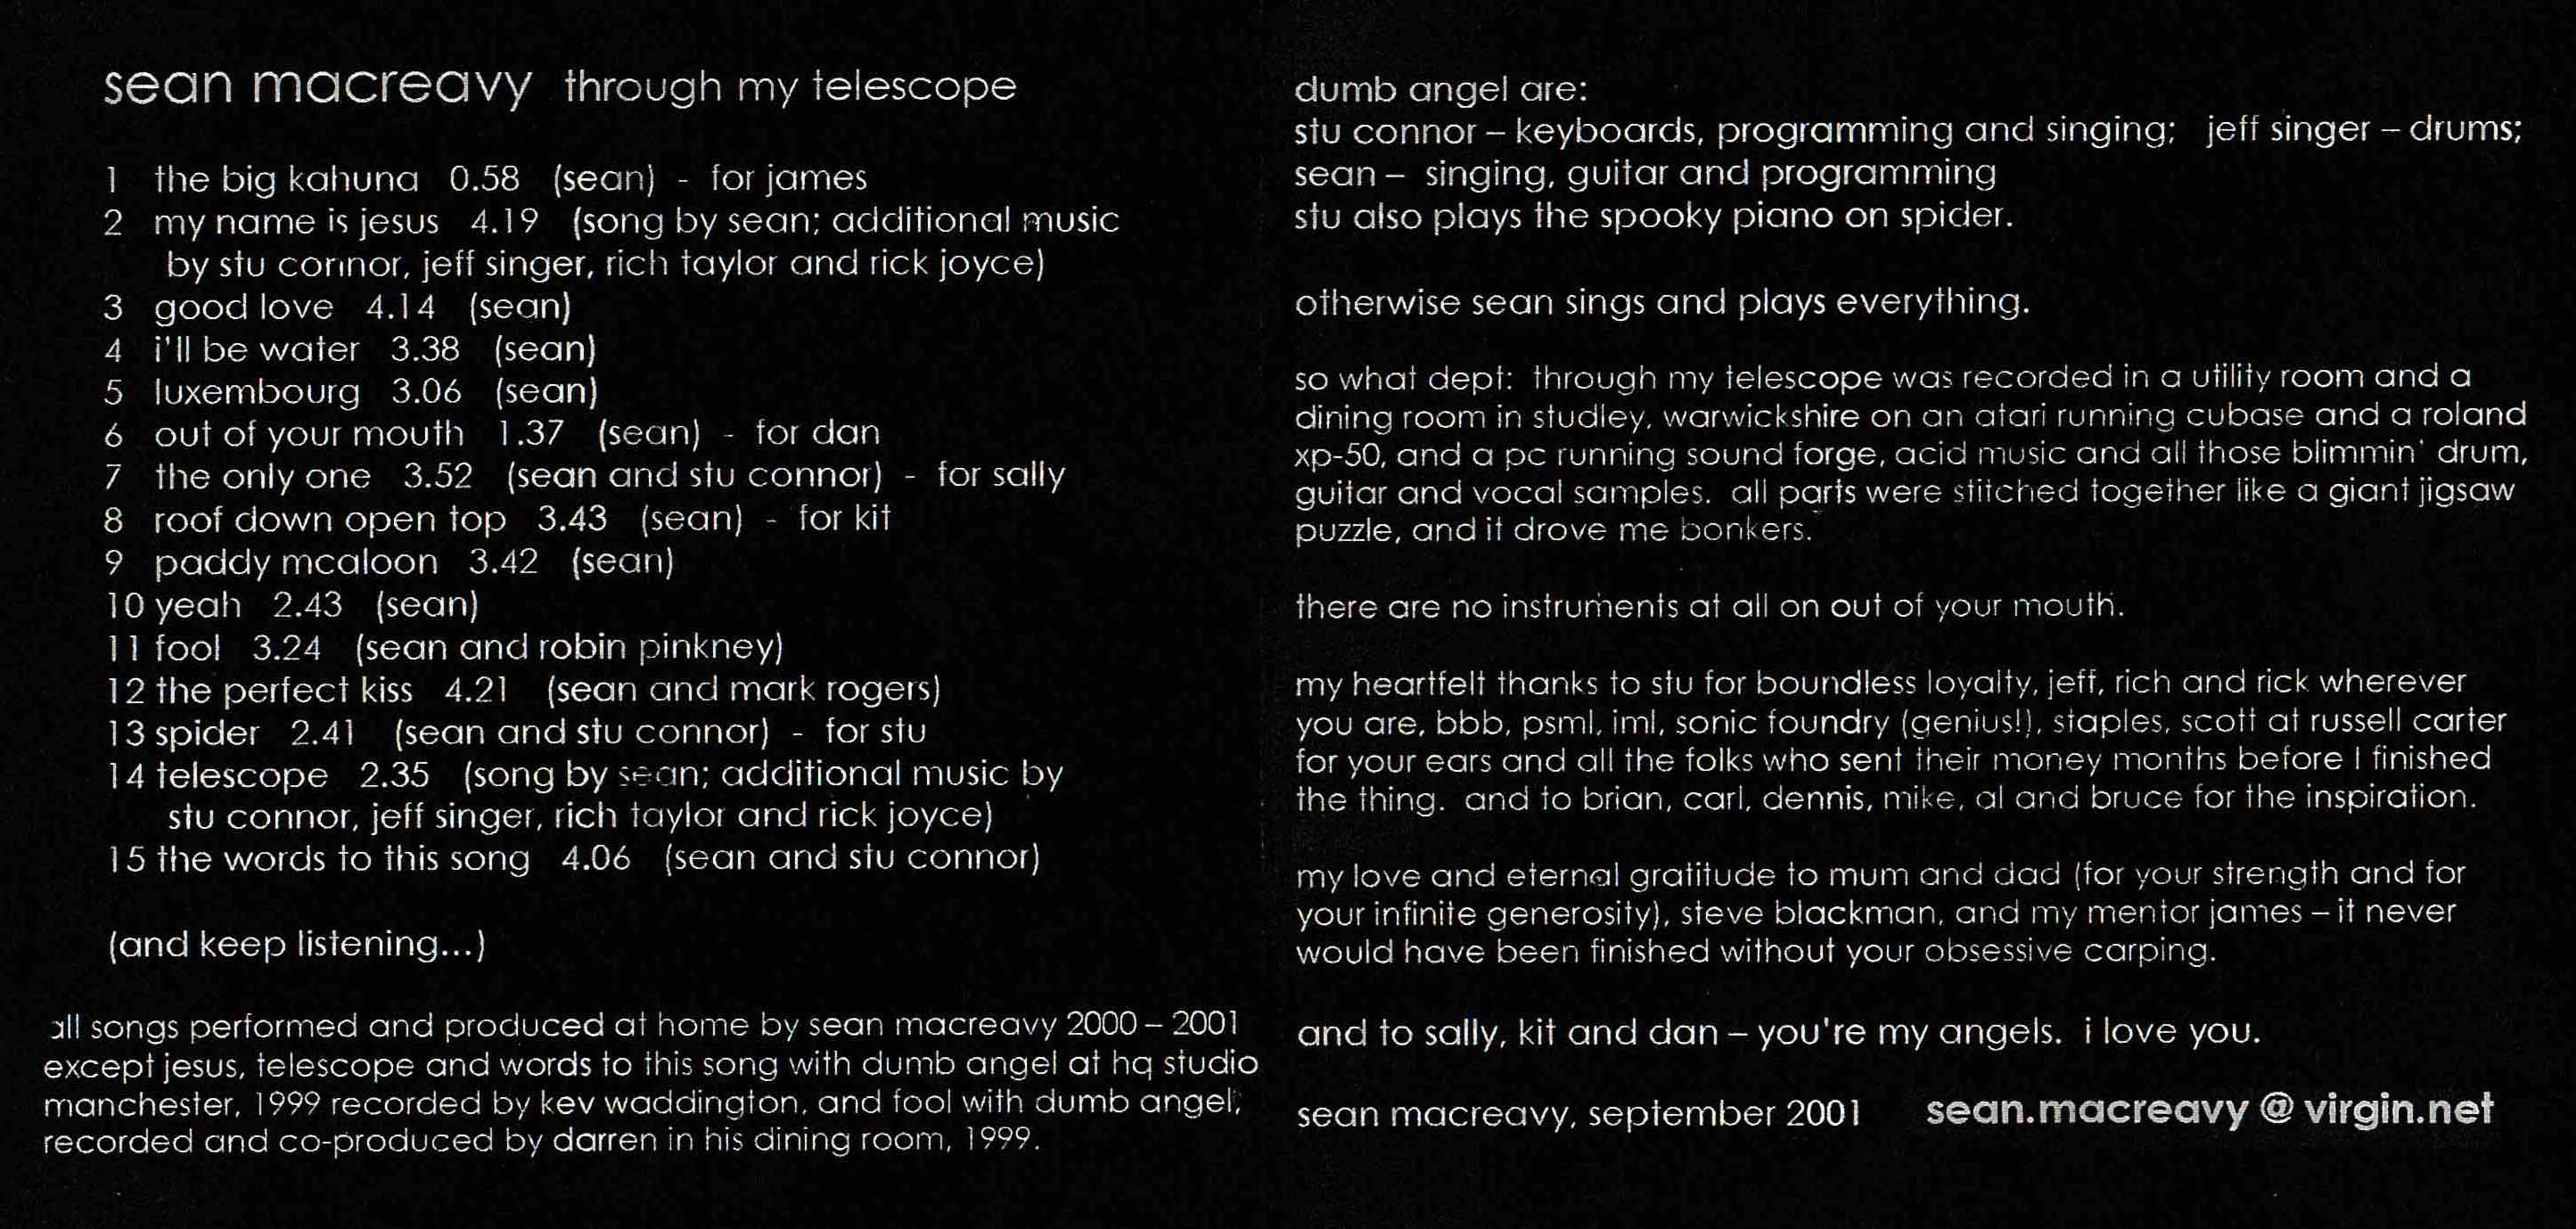 Sean Macreavy Through My Telescope - liner notes